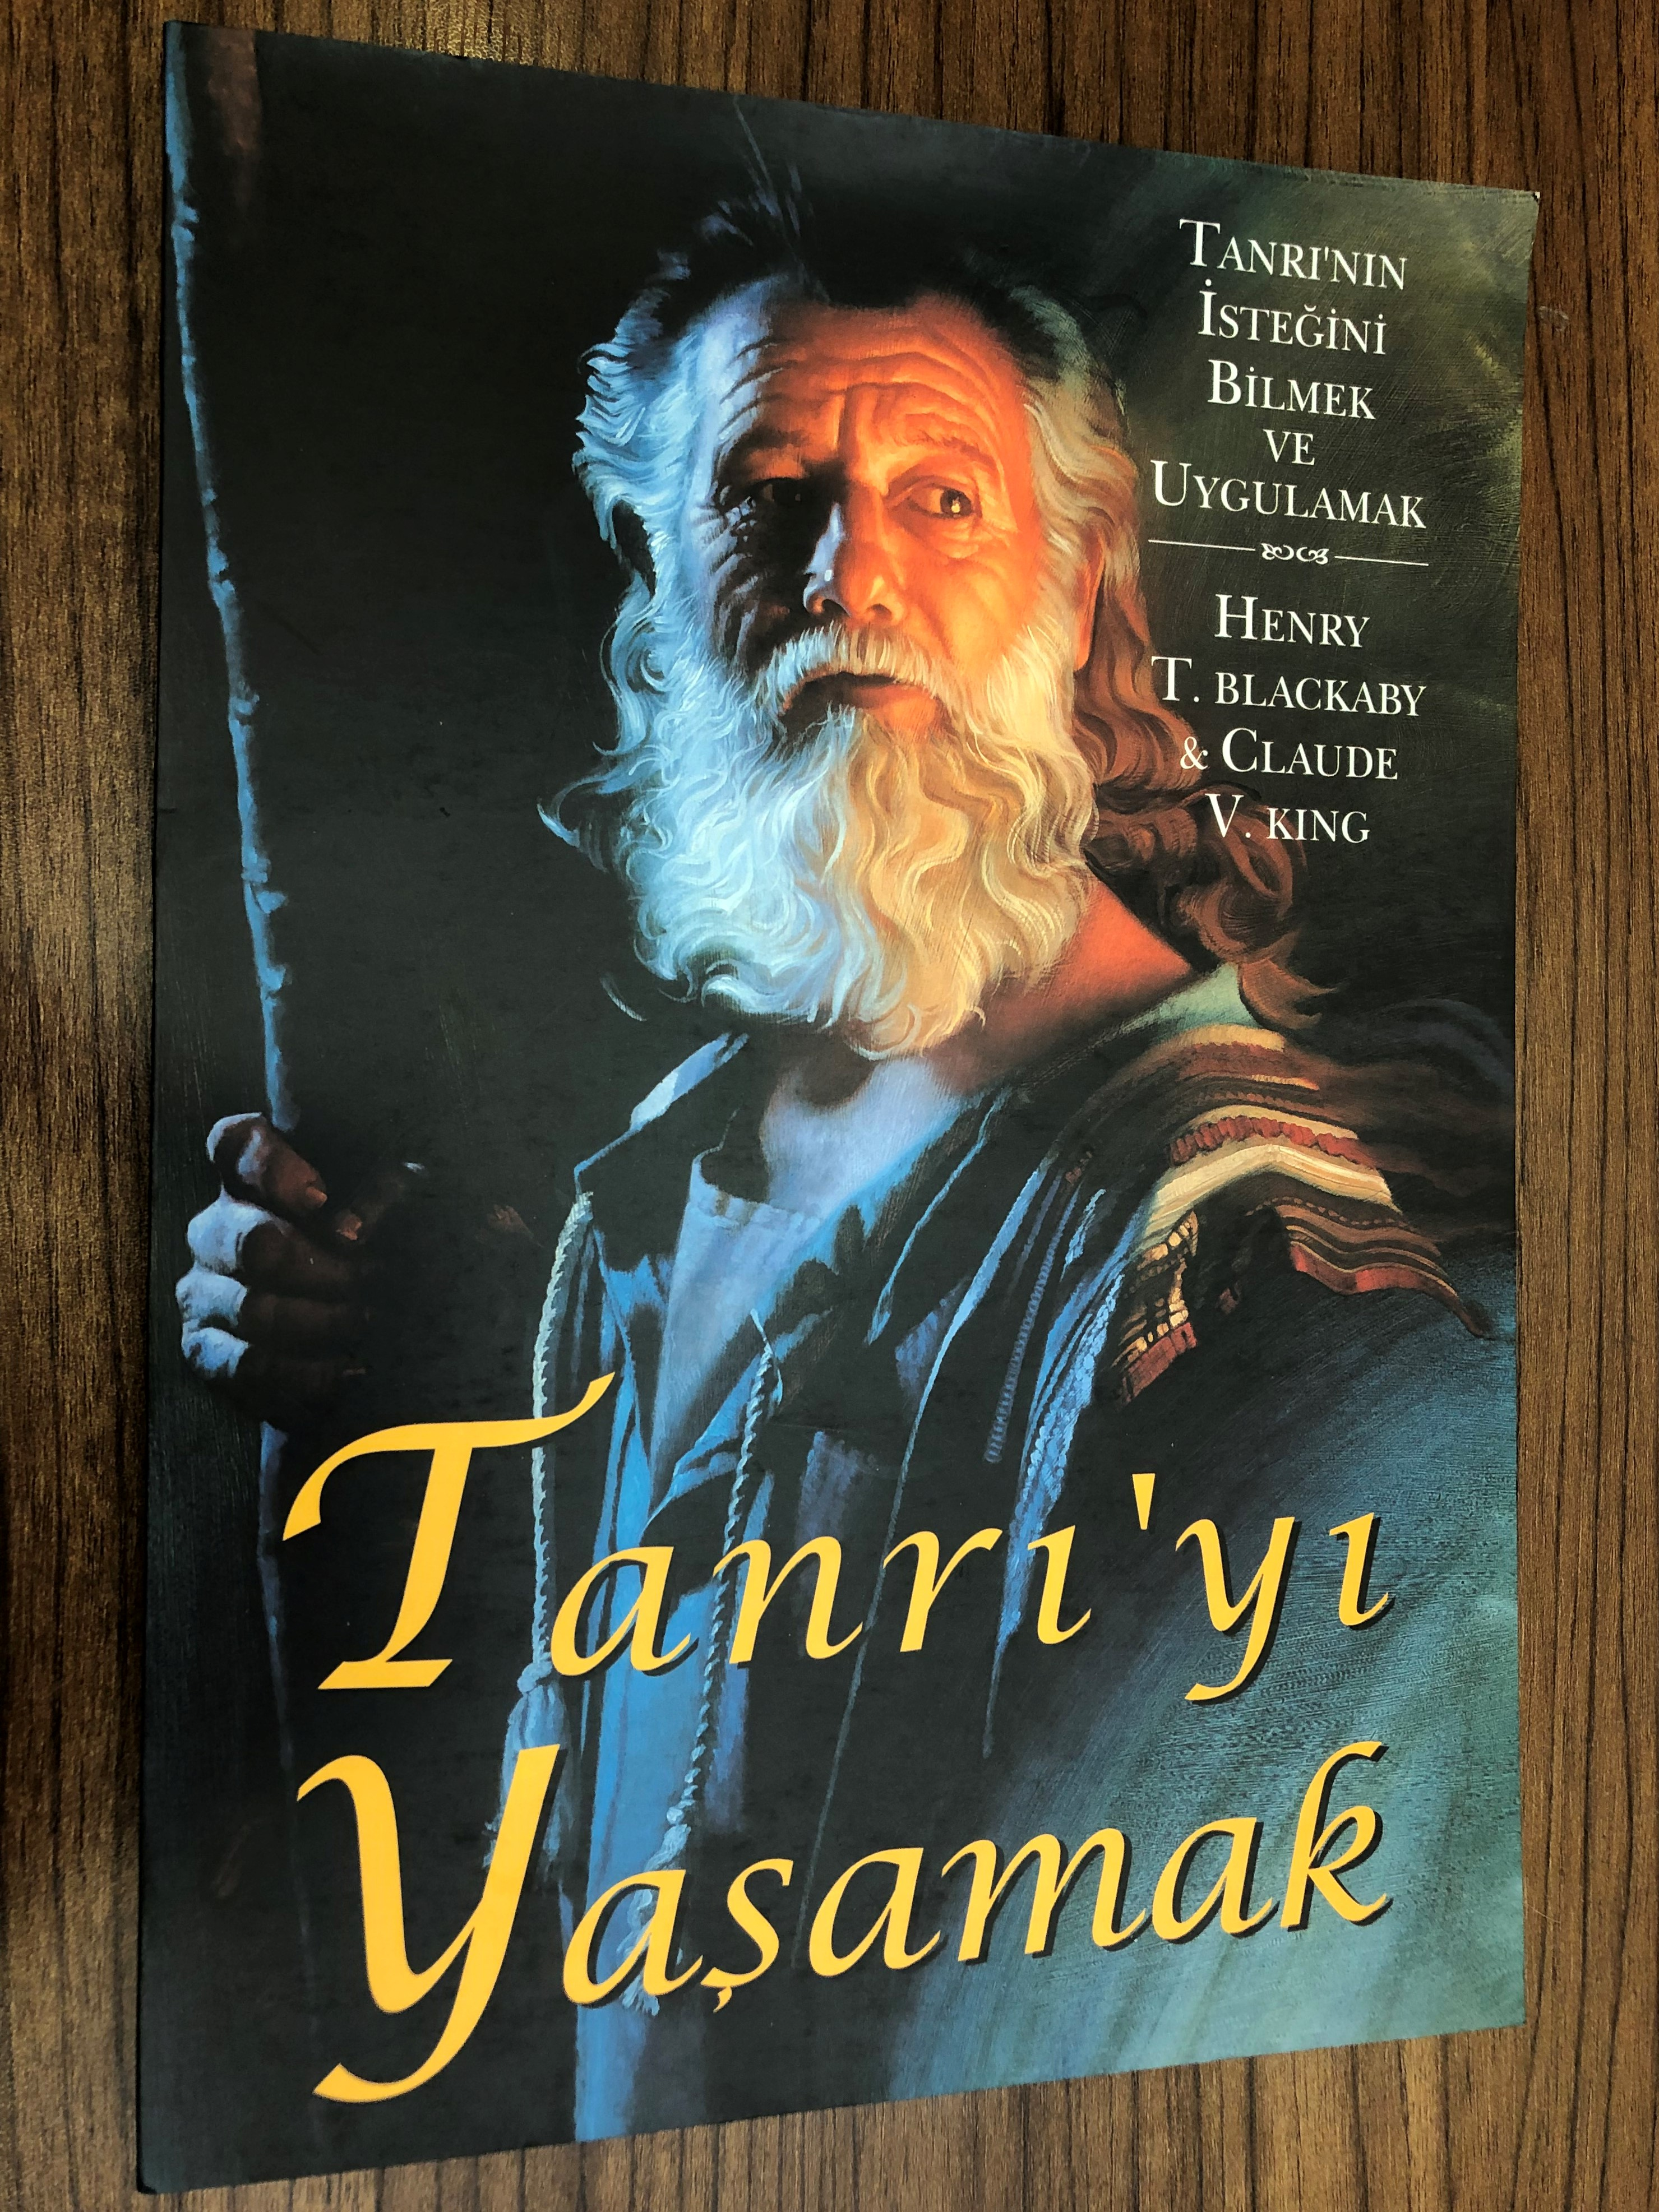 tanri-yi-ya-amak-tanri-nin-iste-ini-bilmek-ve-uygulamak-by-henry-t.-blackaby-claude-v.-king-turkish-translation-of-experiencing-god-knowing-and-doing-the-will-of-god-yeni-ya-am-yayinlari-paperback-2000-1-.jpg